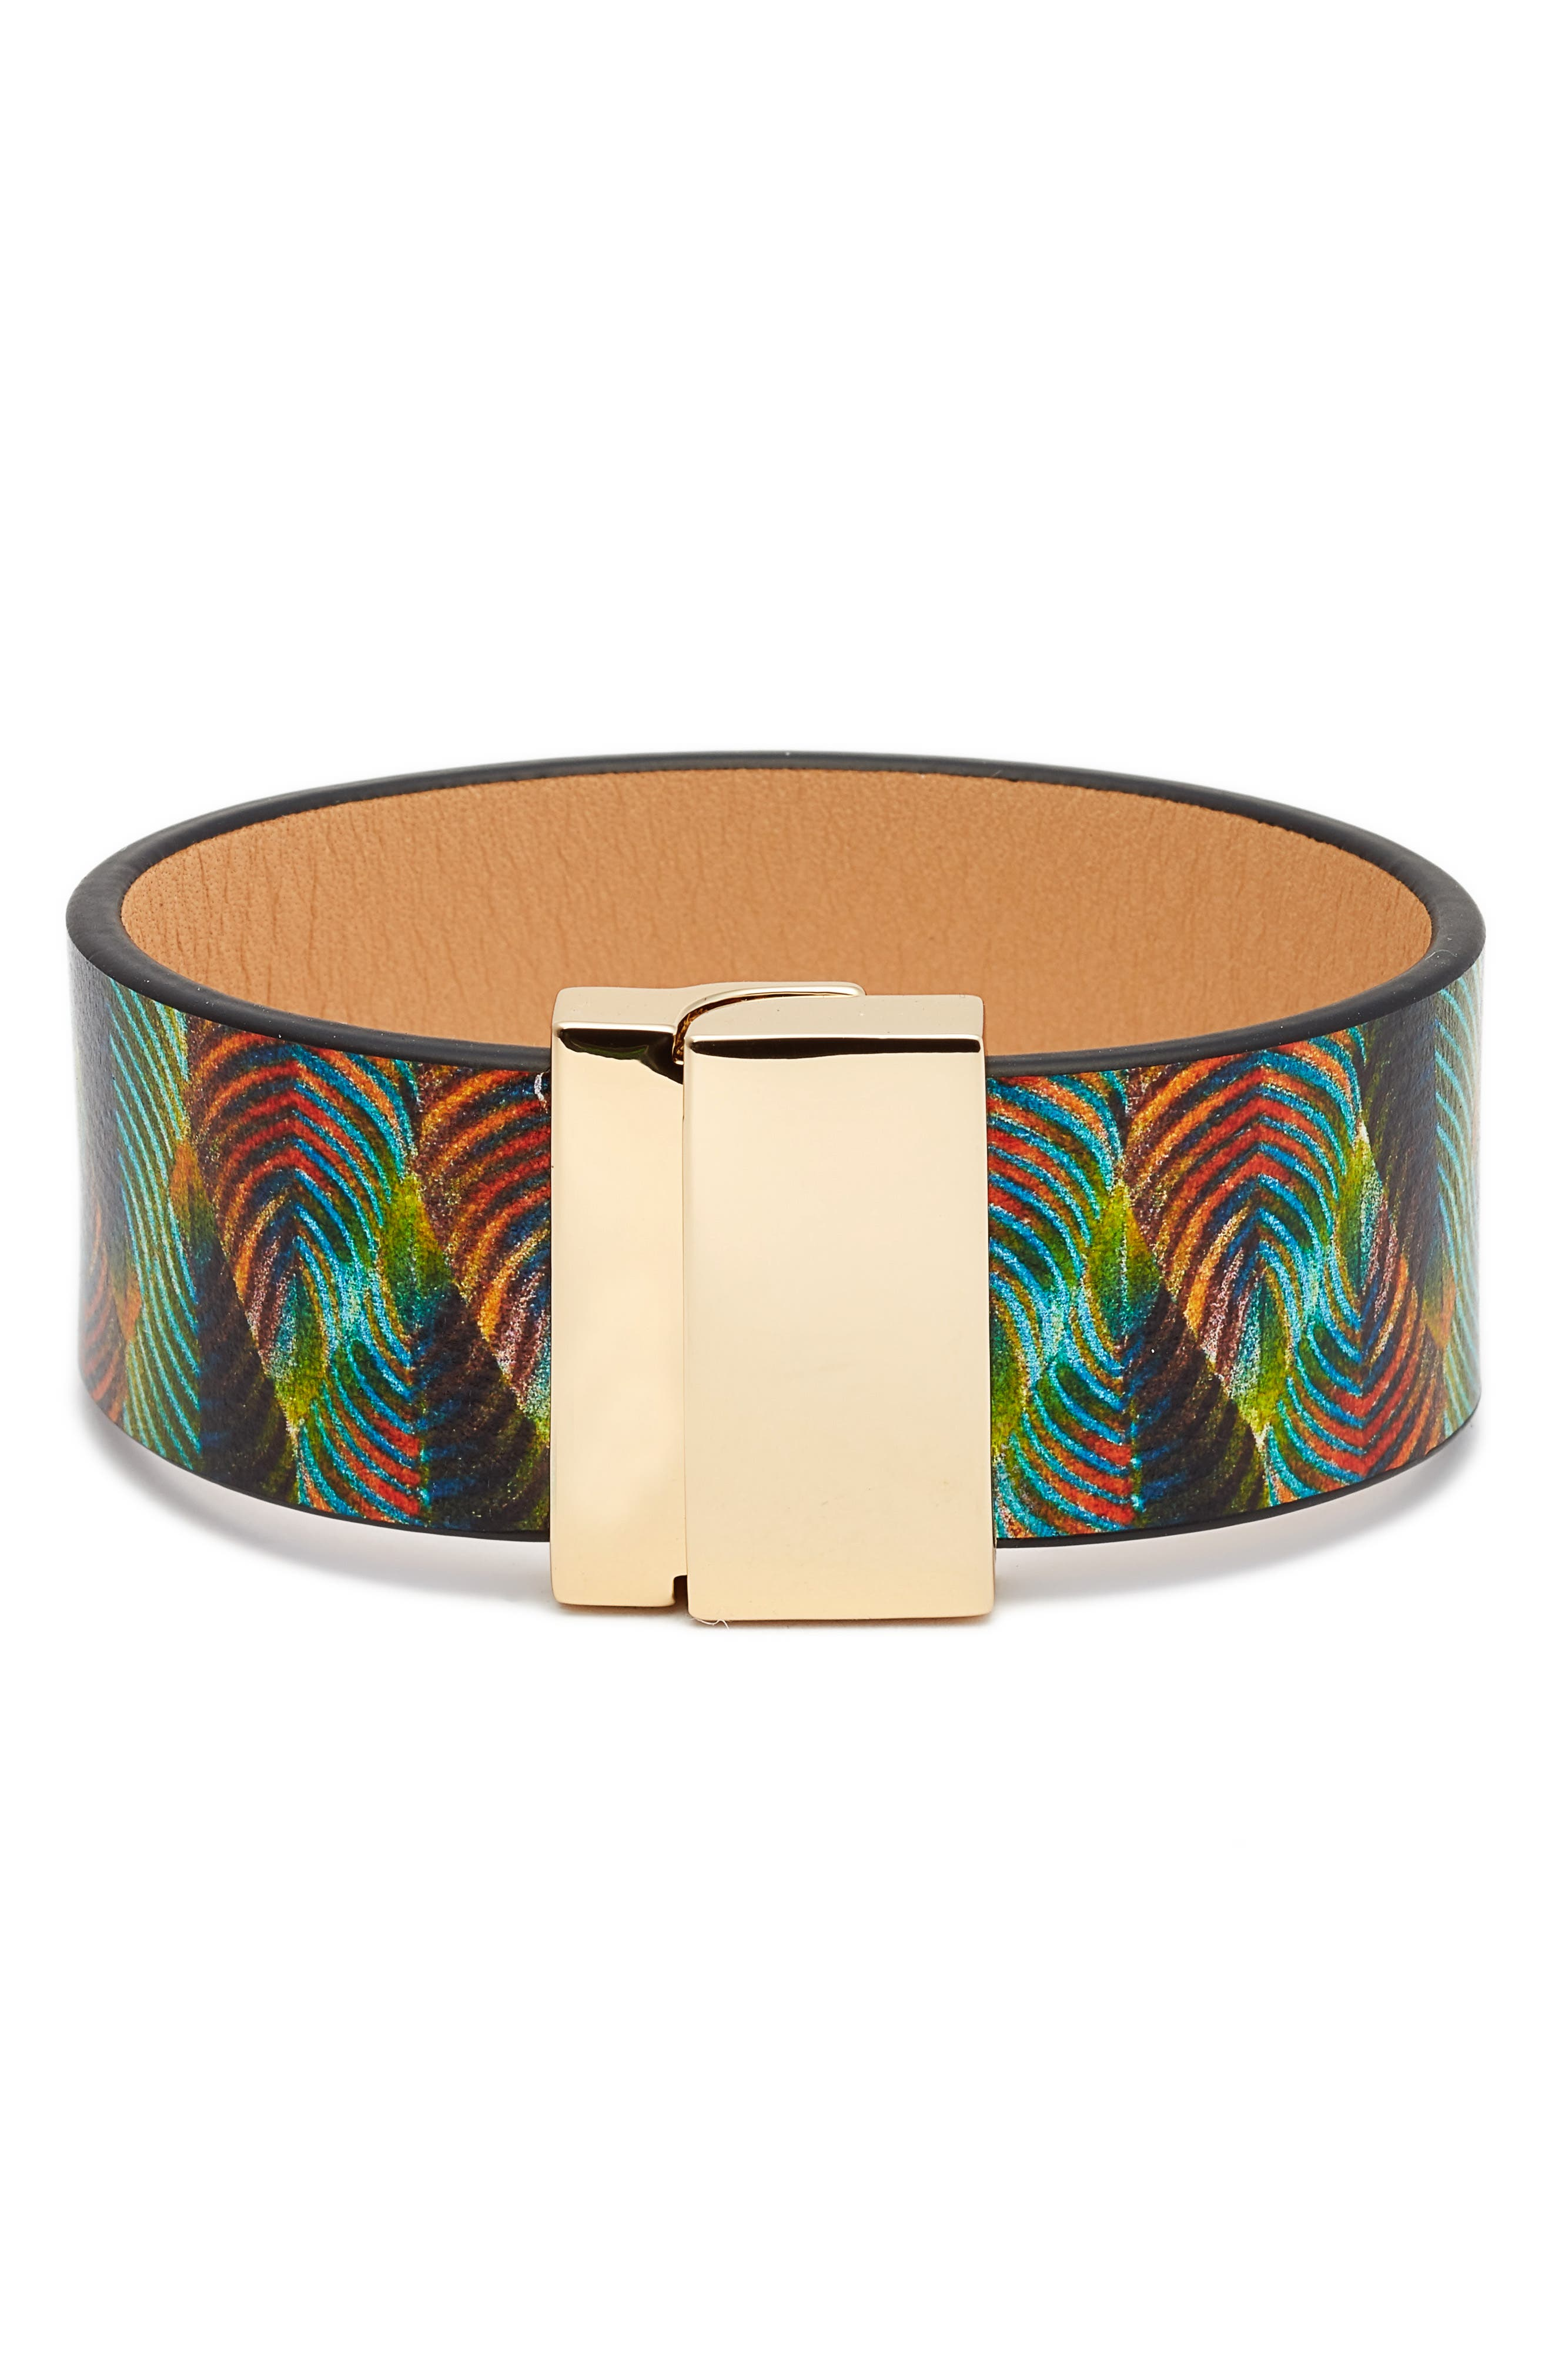 Vince Camuto Leather Strap Bracelet